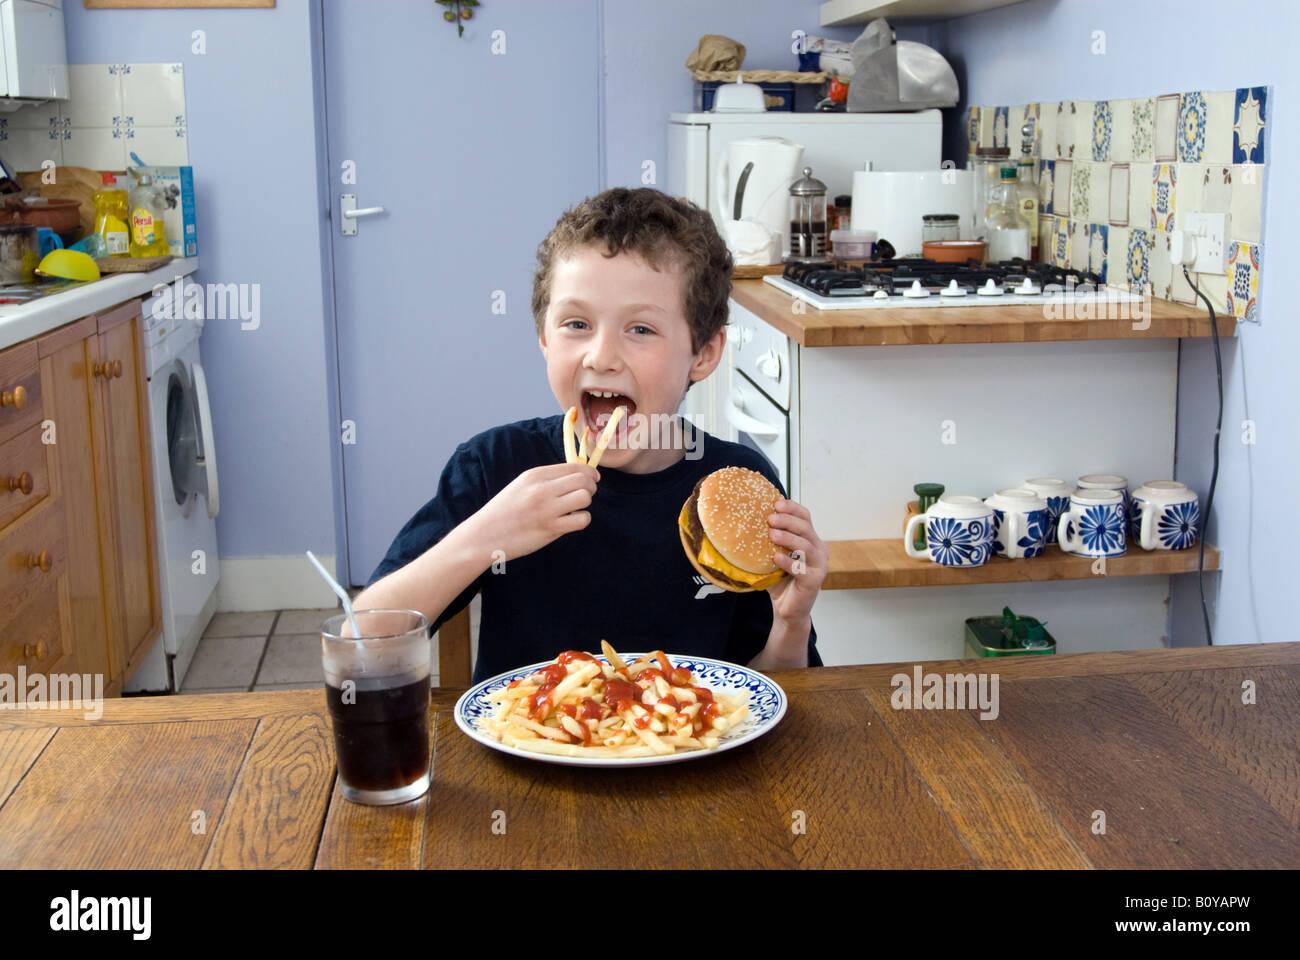 Boy eating junk food at home, England UK - Stock Image